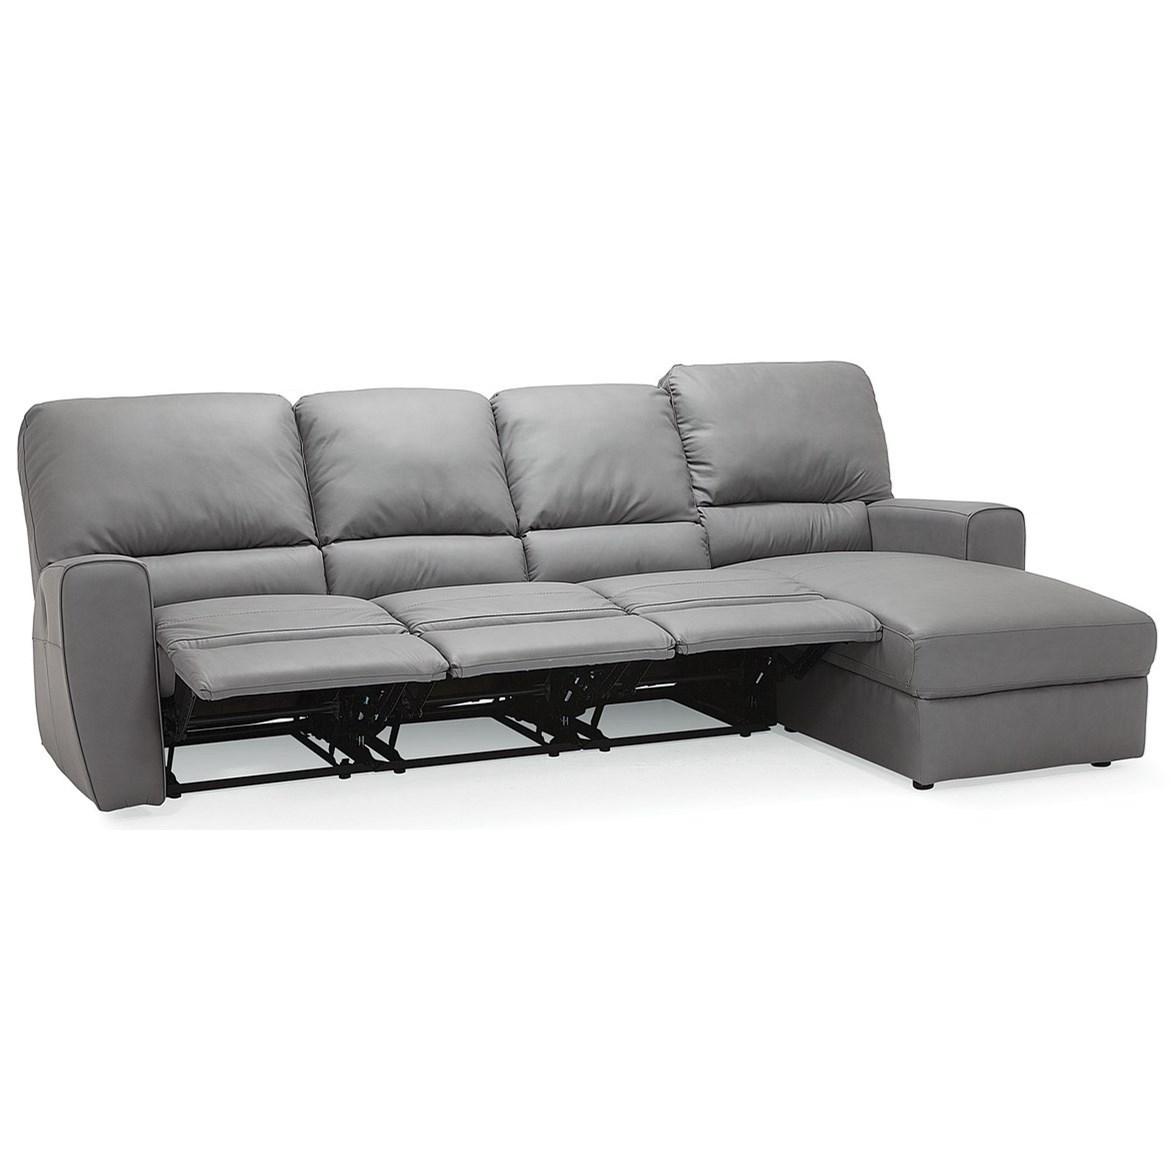 Palliser San Francisco 4-Seat Reclining Sectional Sofa ...